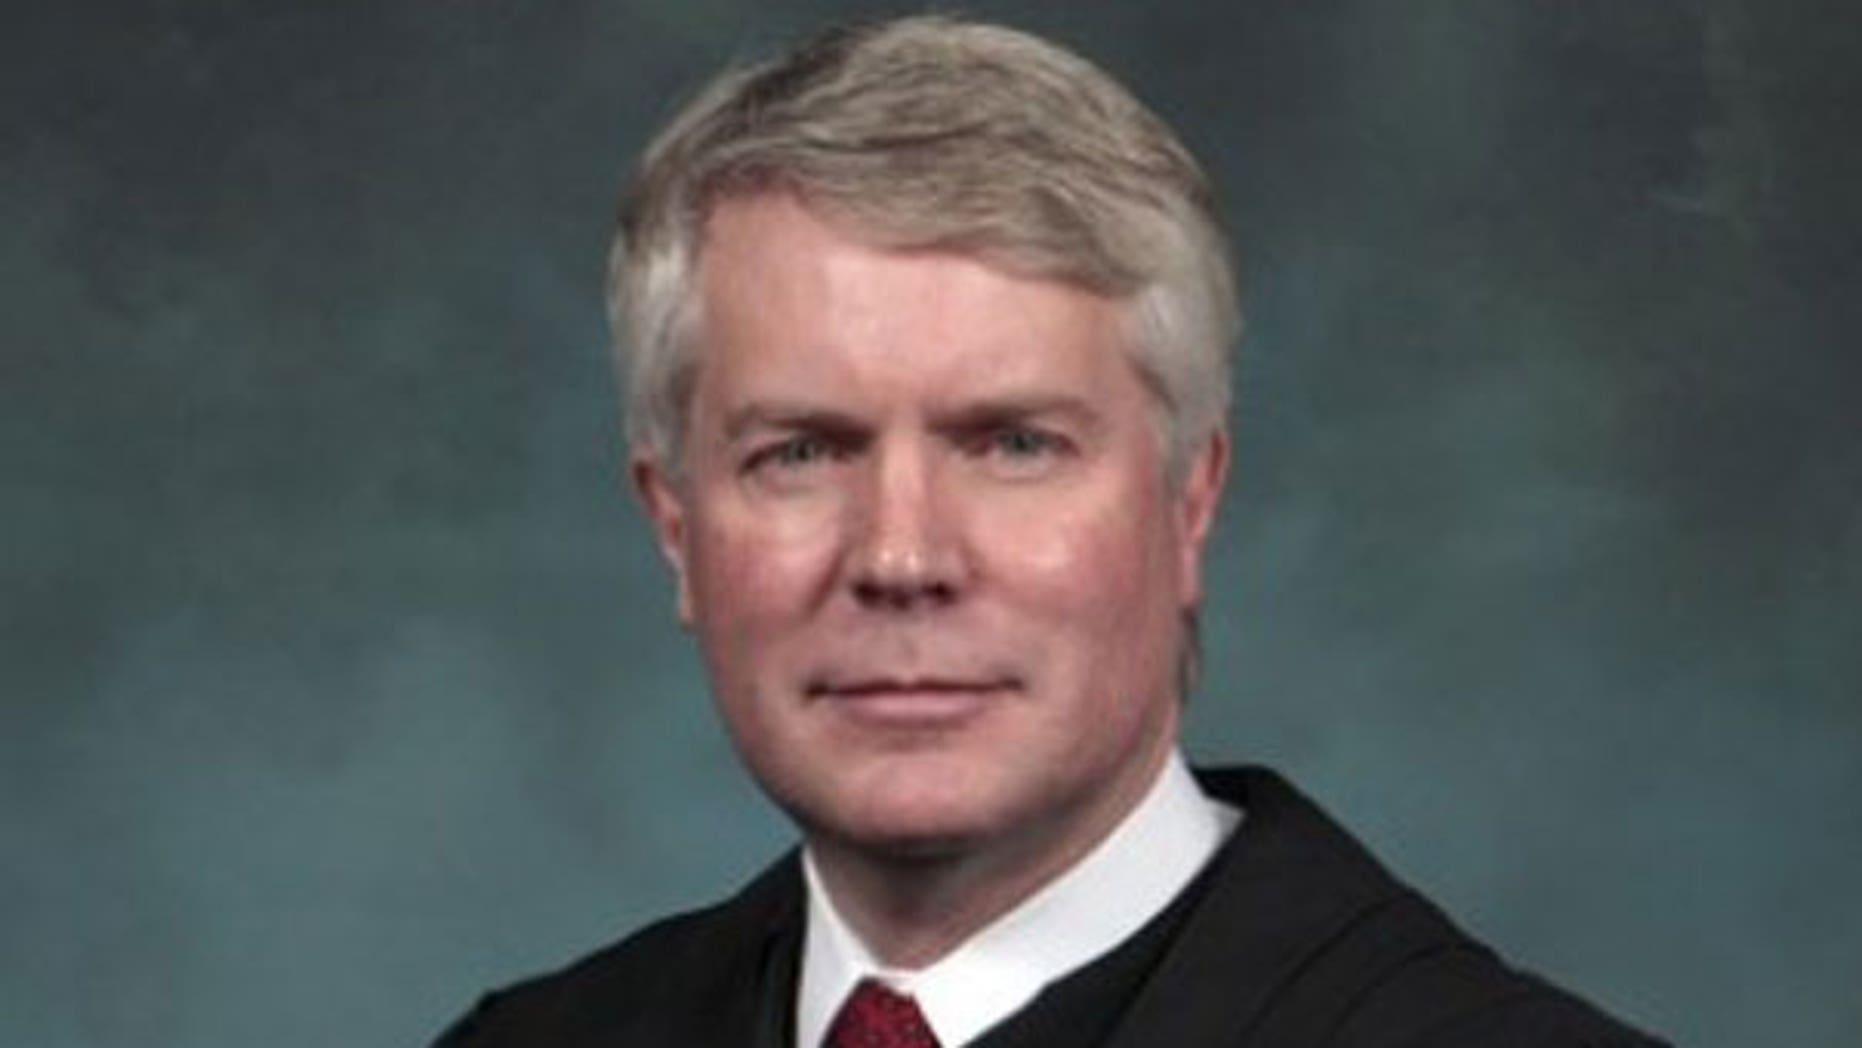 Judge David Hamilton